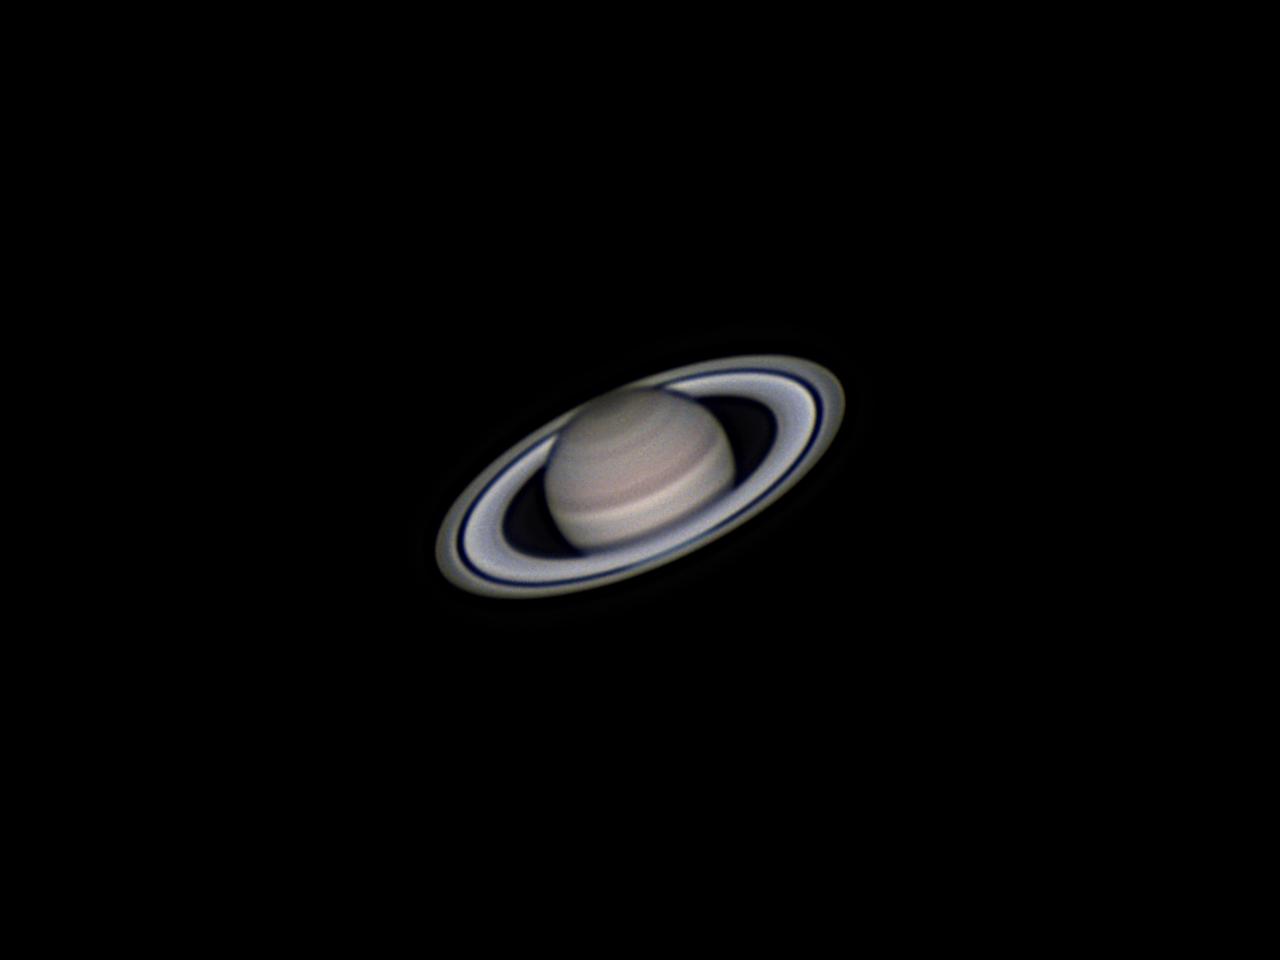 Saturne    Premier Juillet 2019 22H56 TU